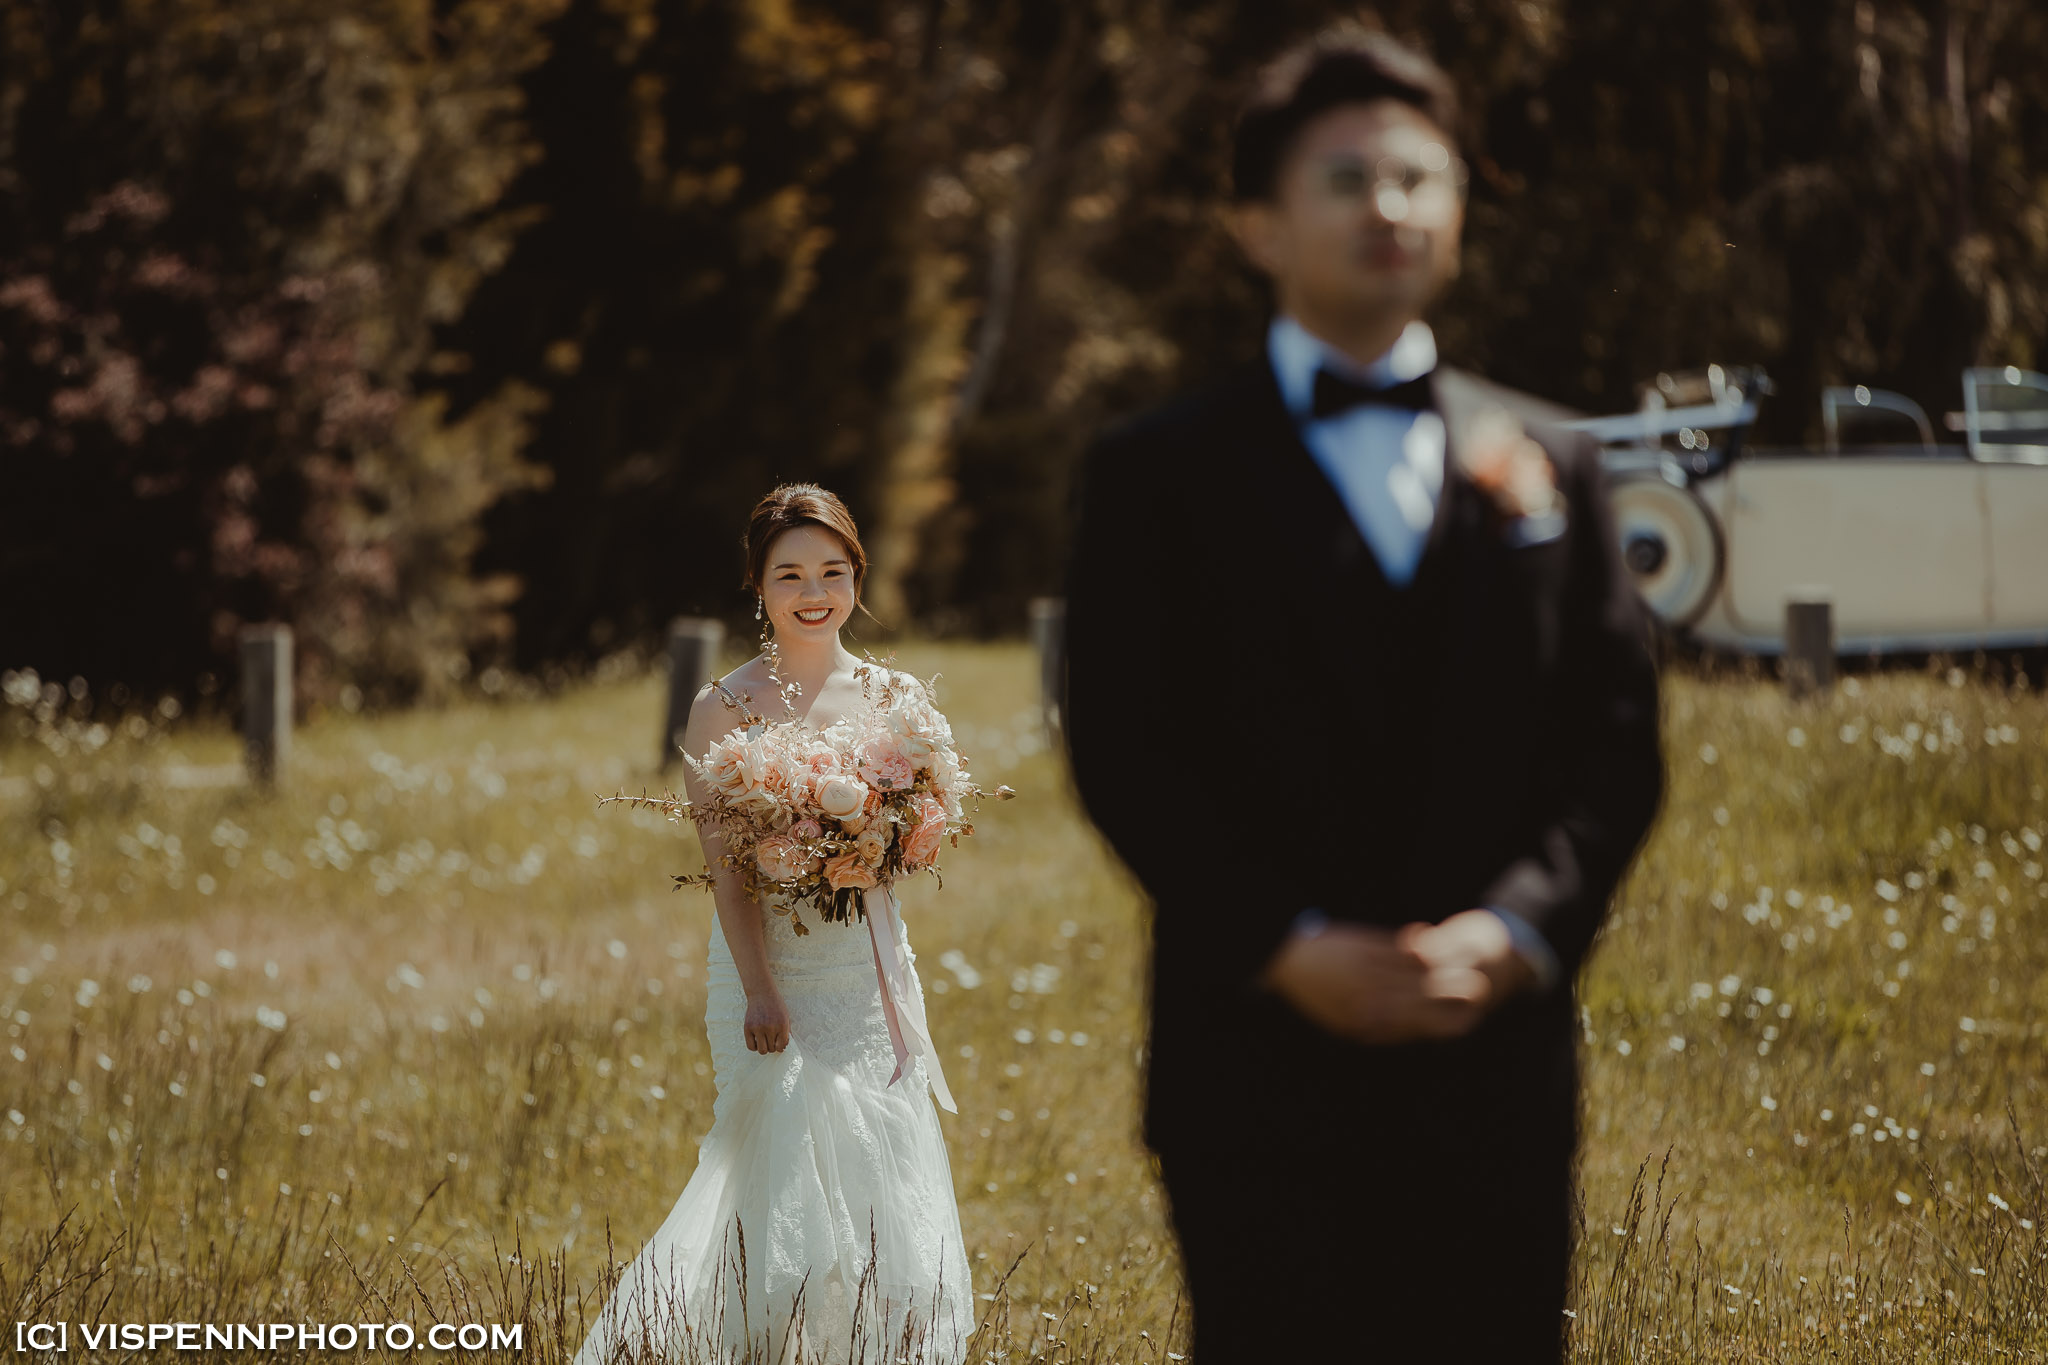 WEDDING DAY Photography Melbourne ElitaPB 05347 2P 1DX2 ZHPENN